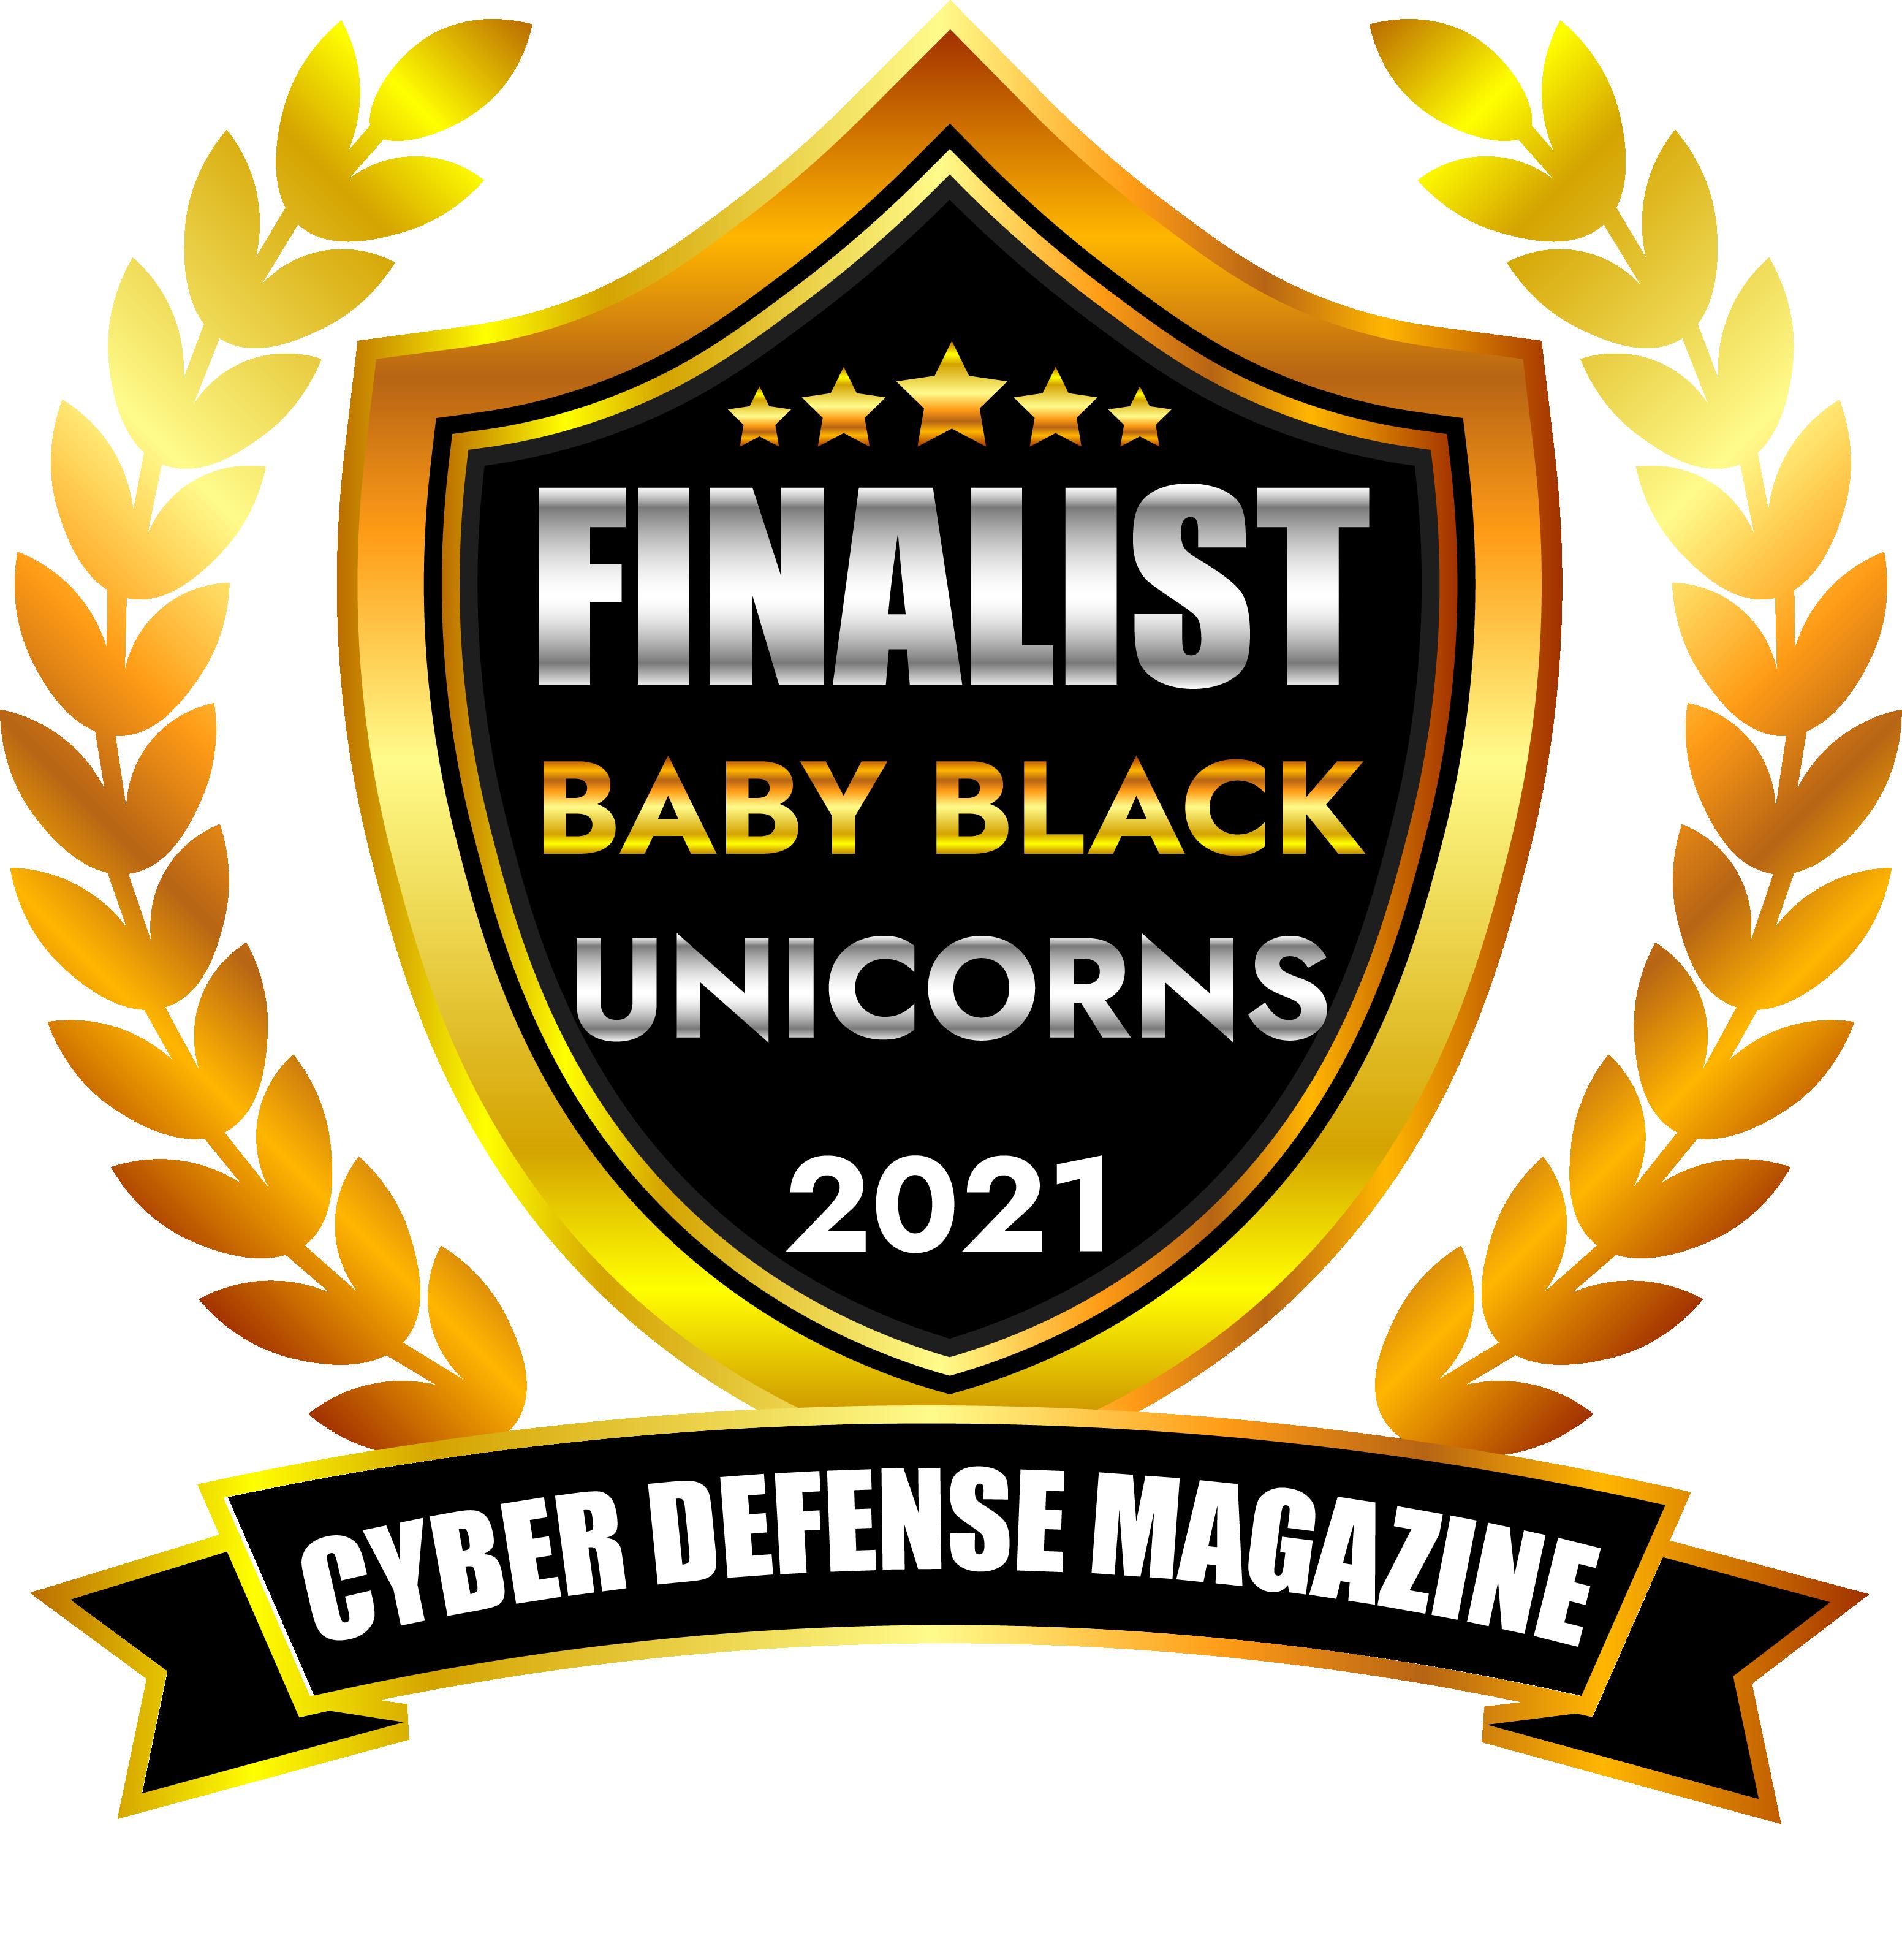 dnsfilter baby black unicorn finalist 2021